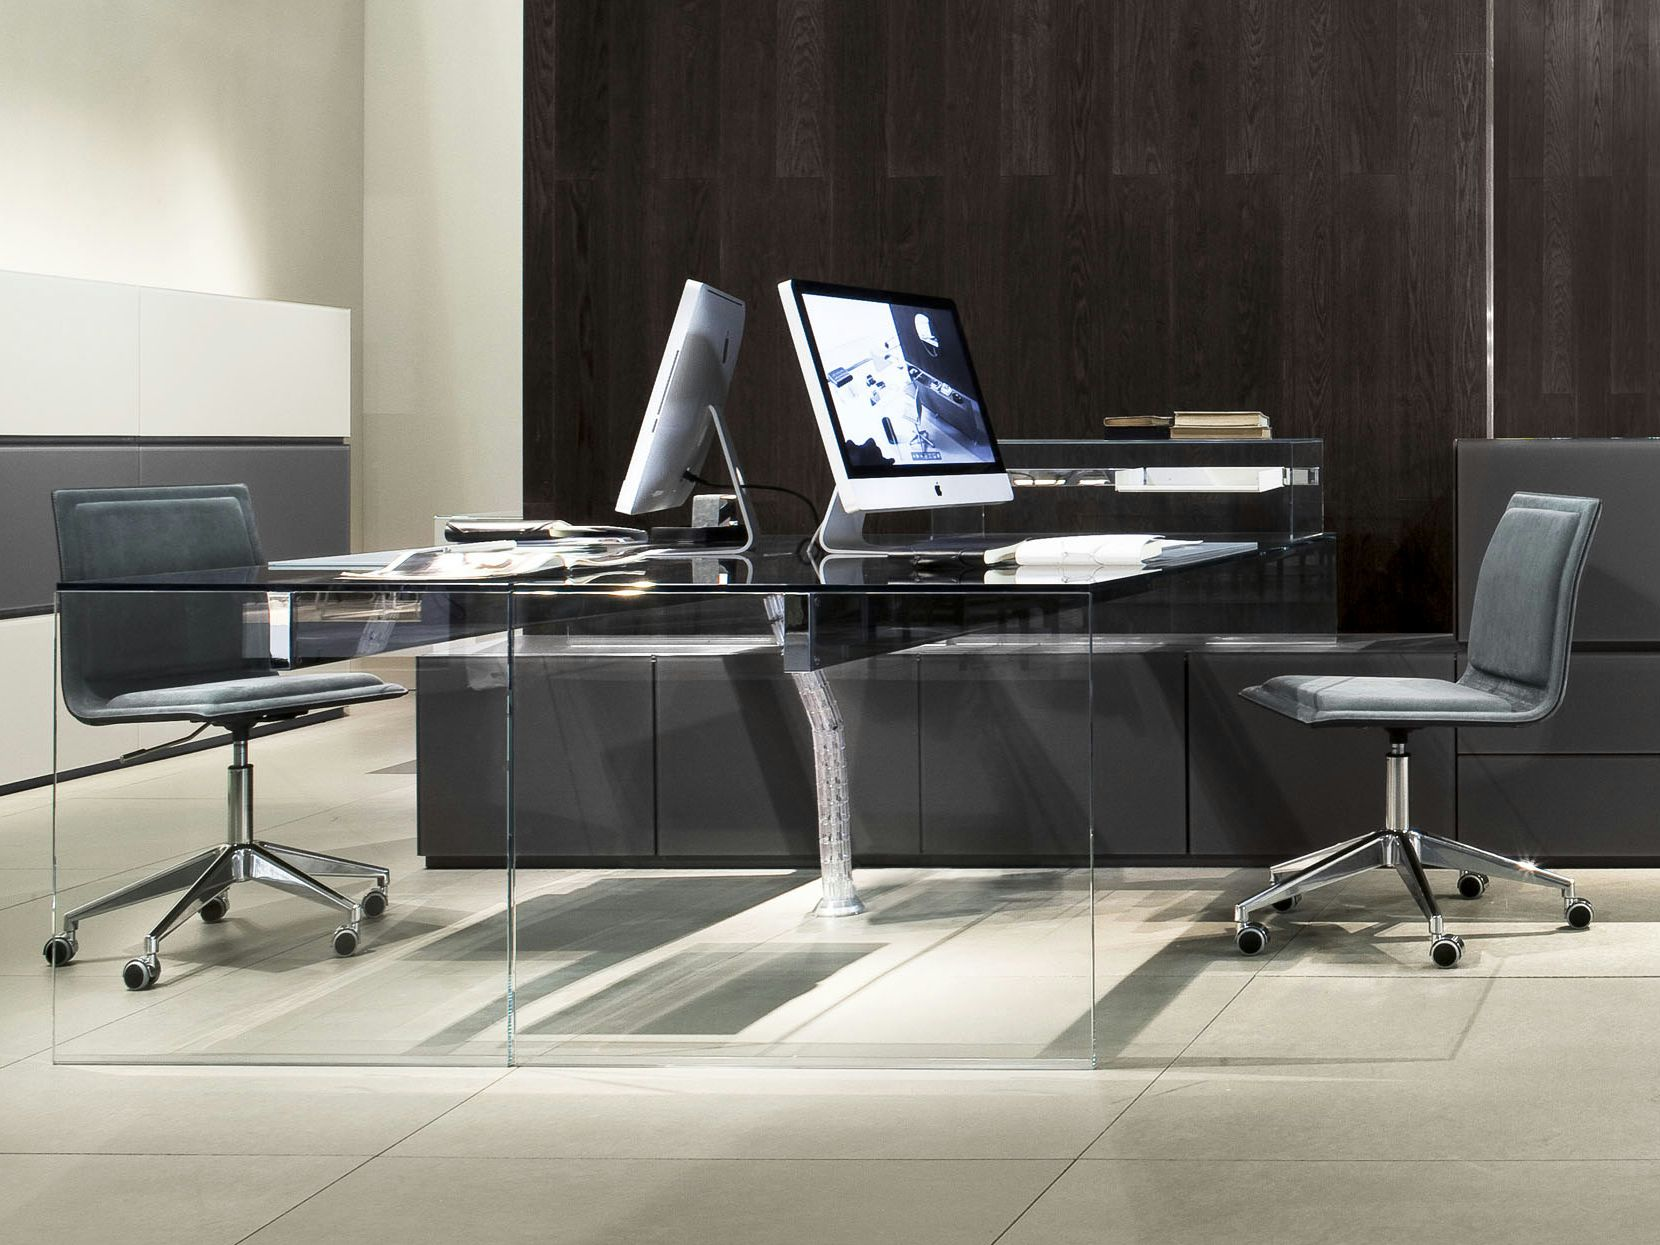 Crystal Writing Desk Air 1 Up Collection By Gallotti Radice Design Pinuccio Borgonovo